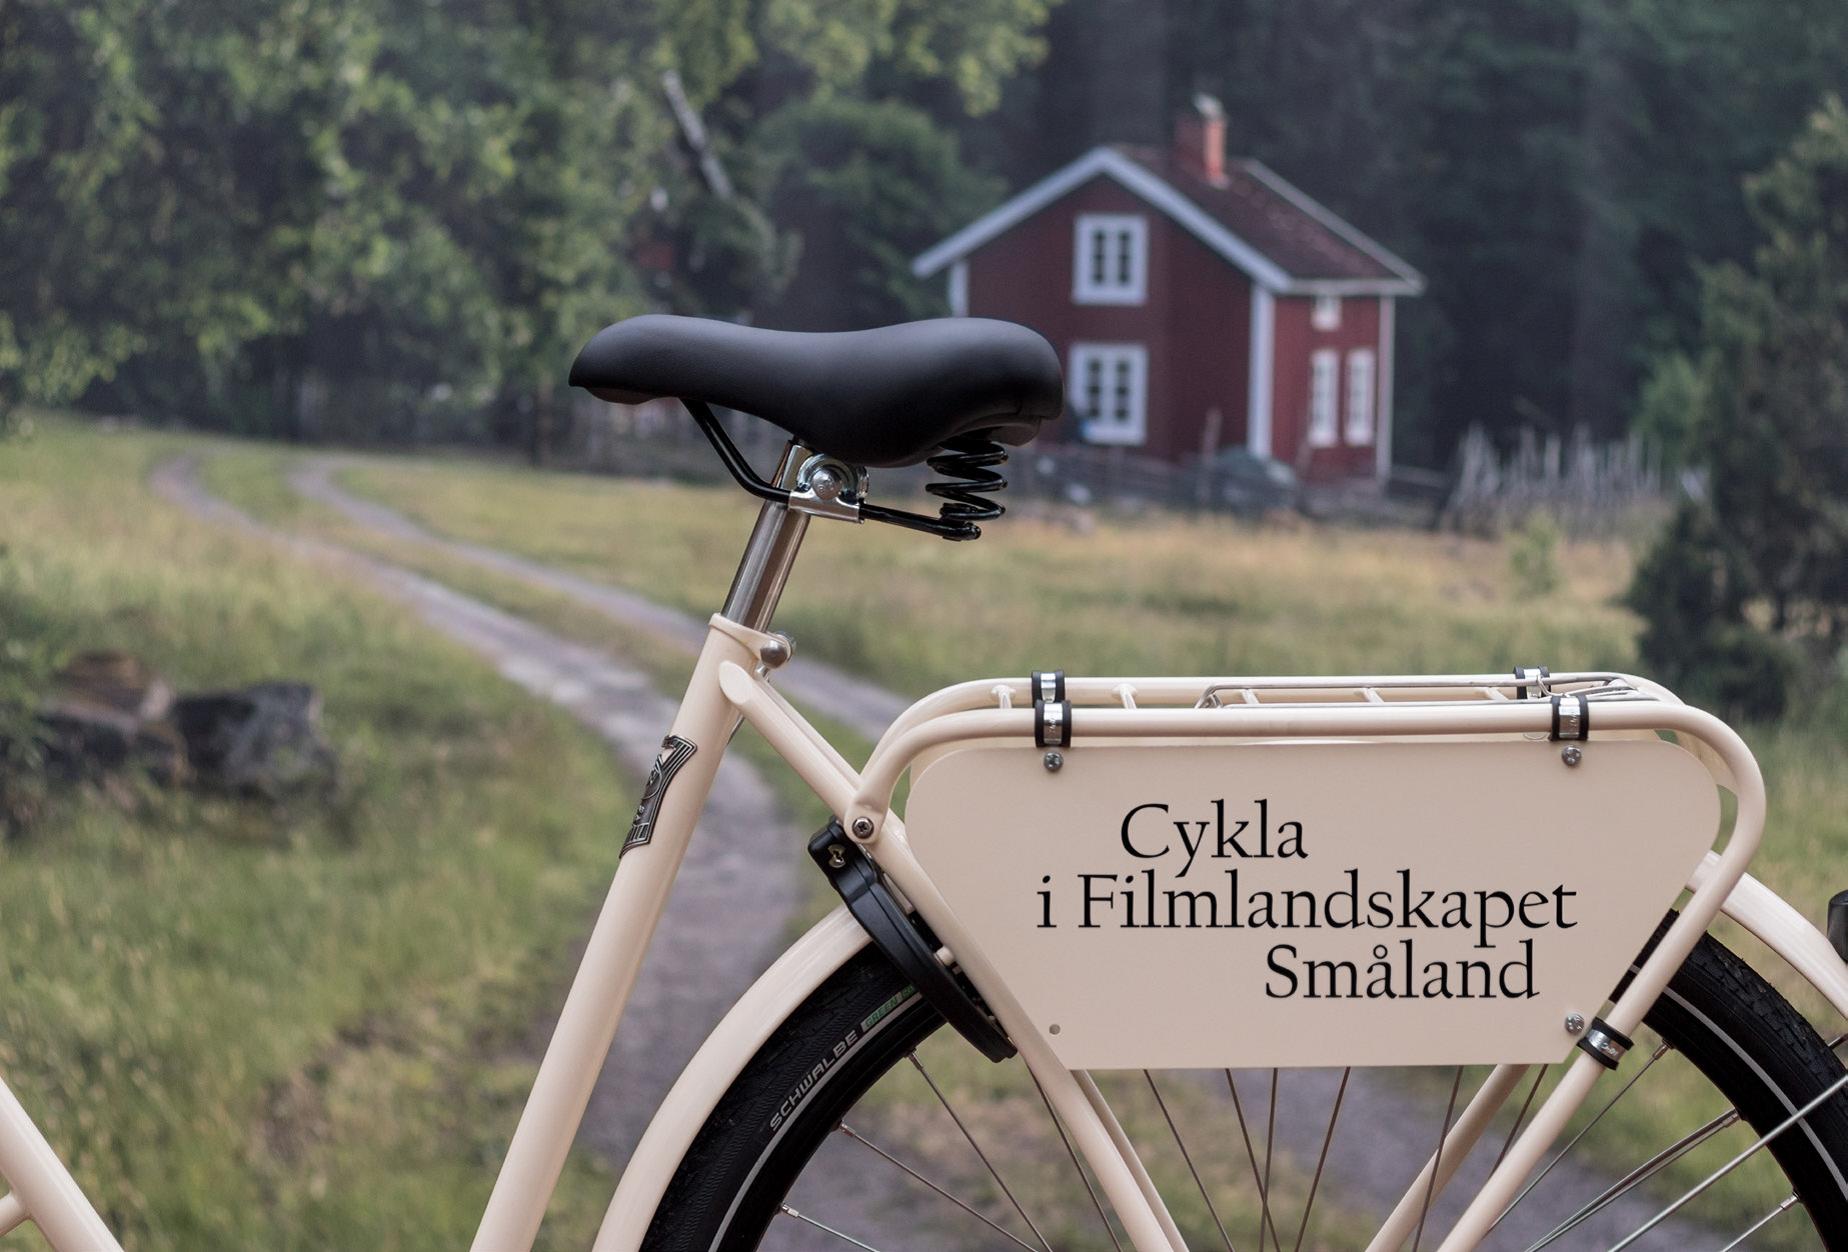 Cyckla i Filmlandskapet Småland